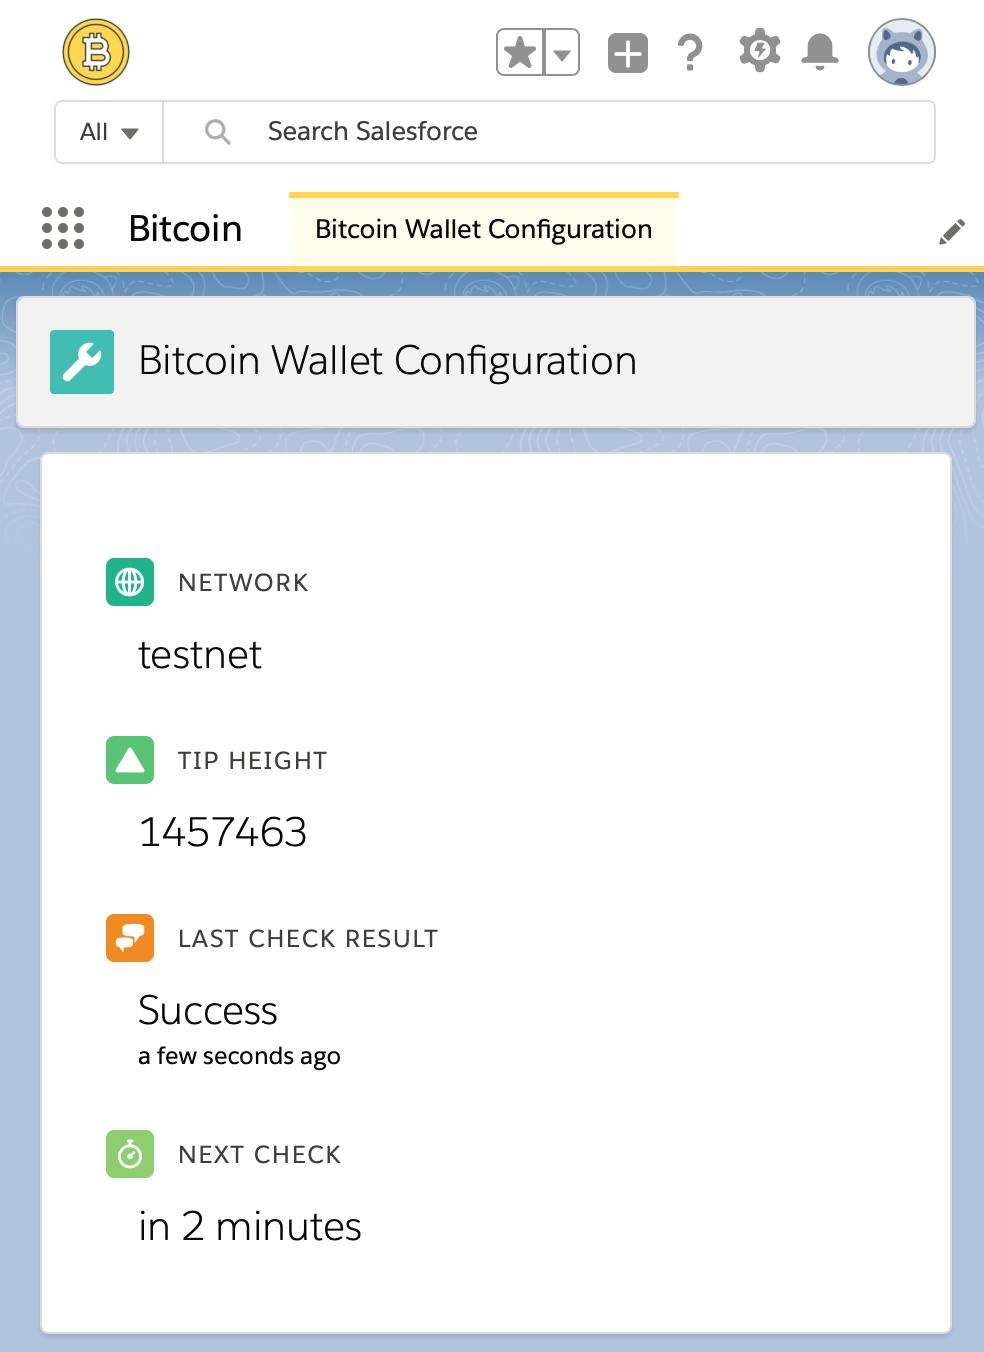 The blockchain status screen